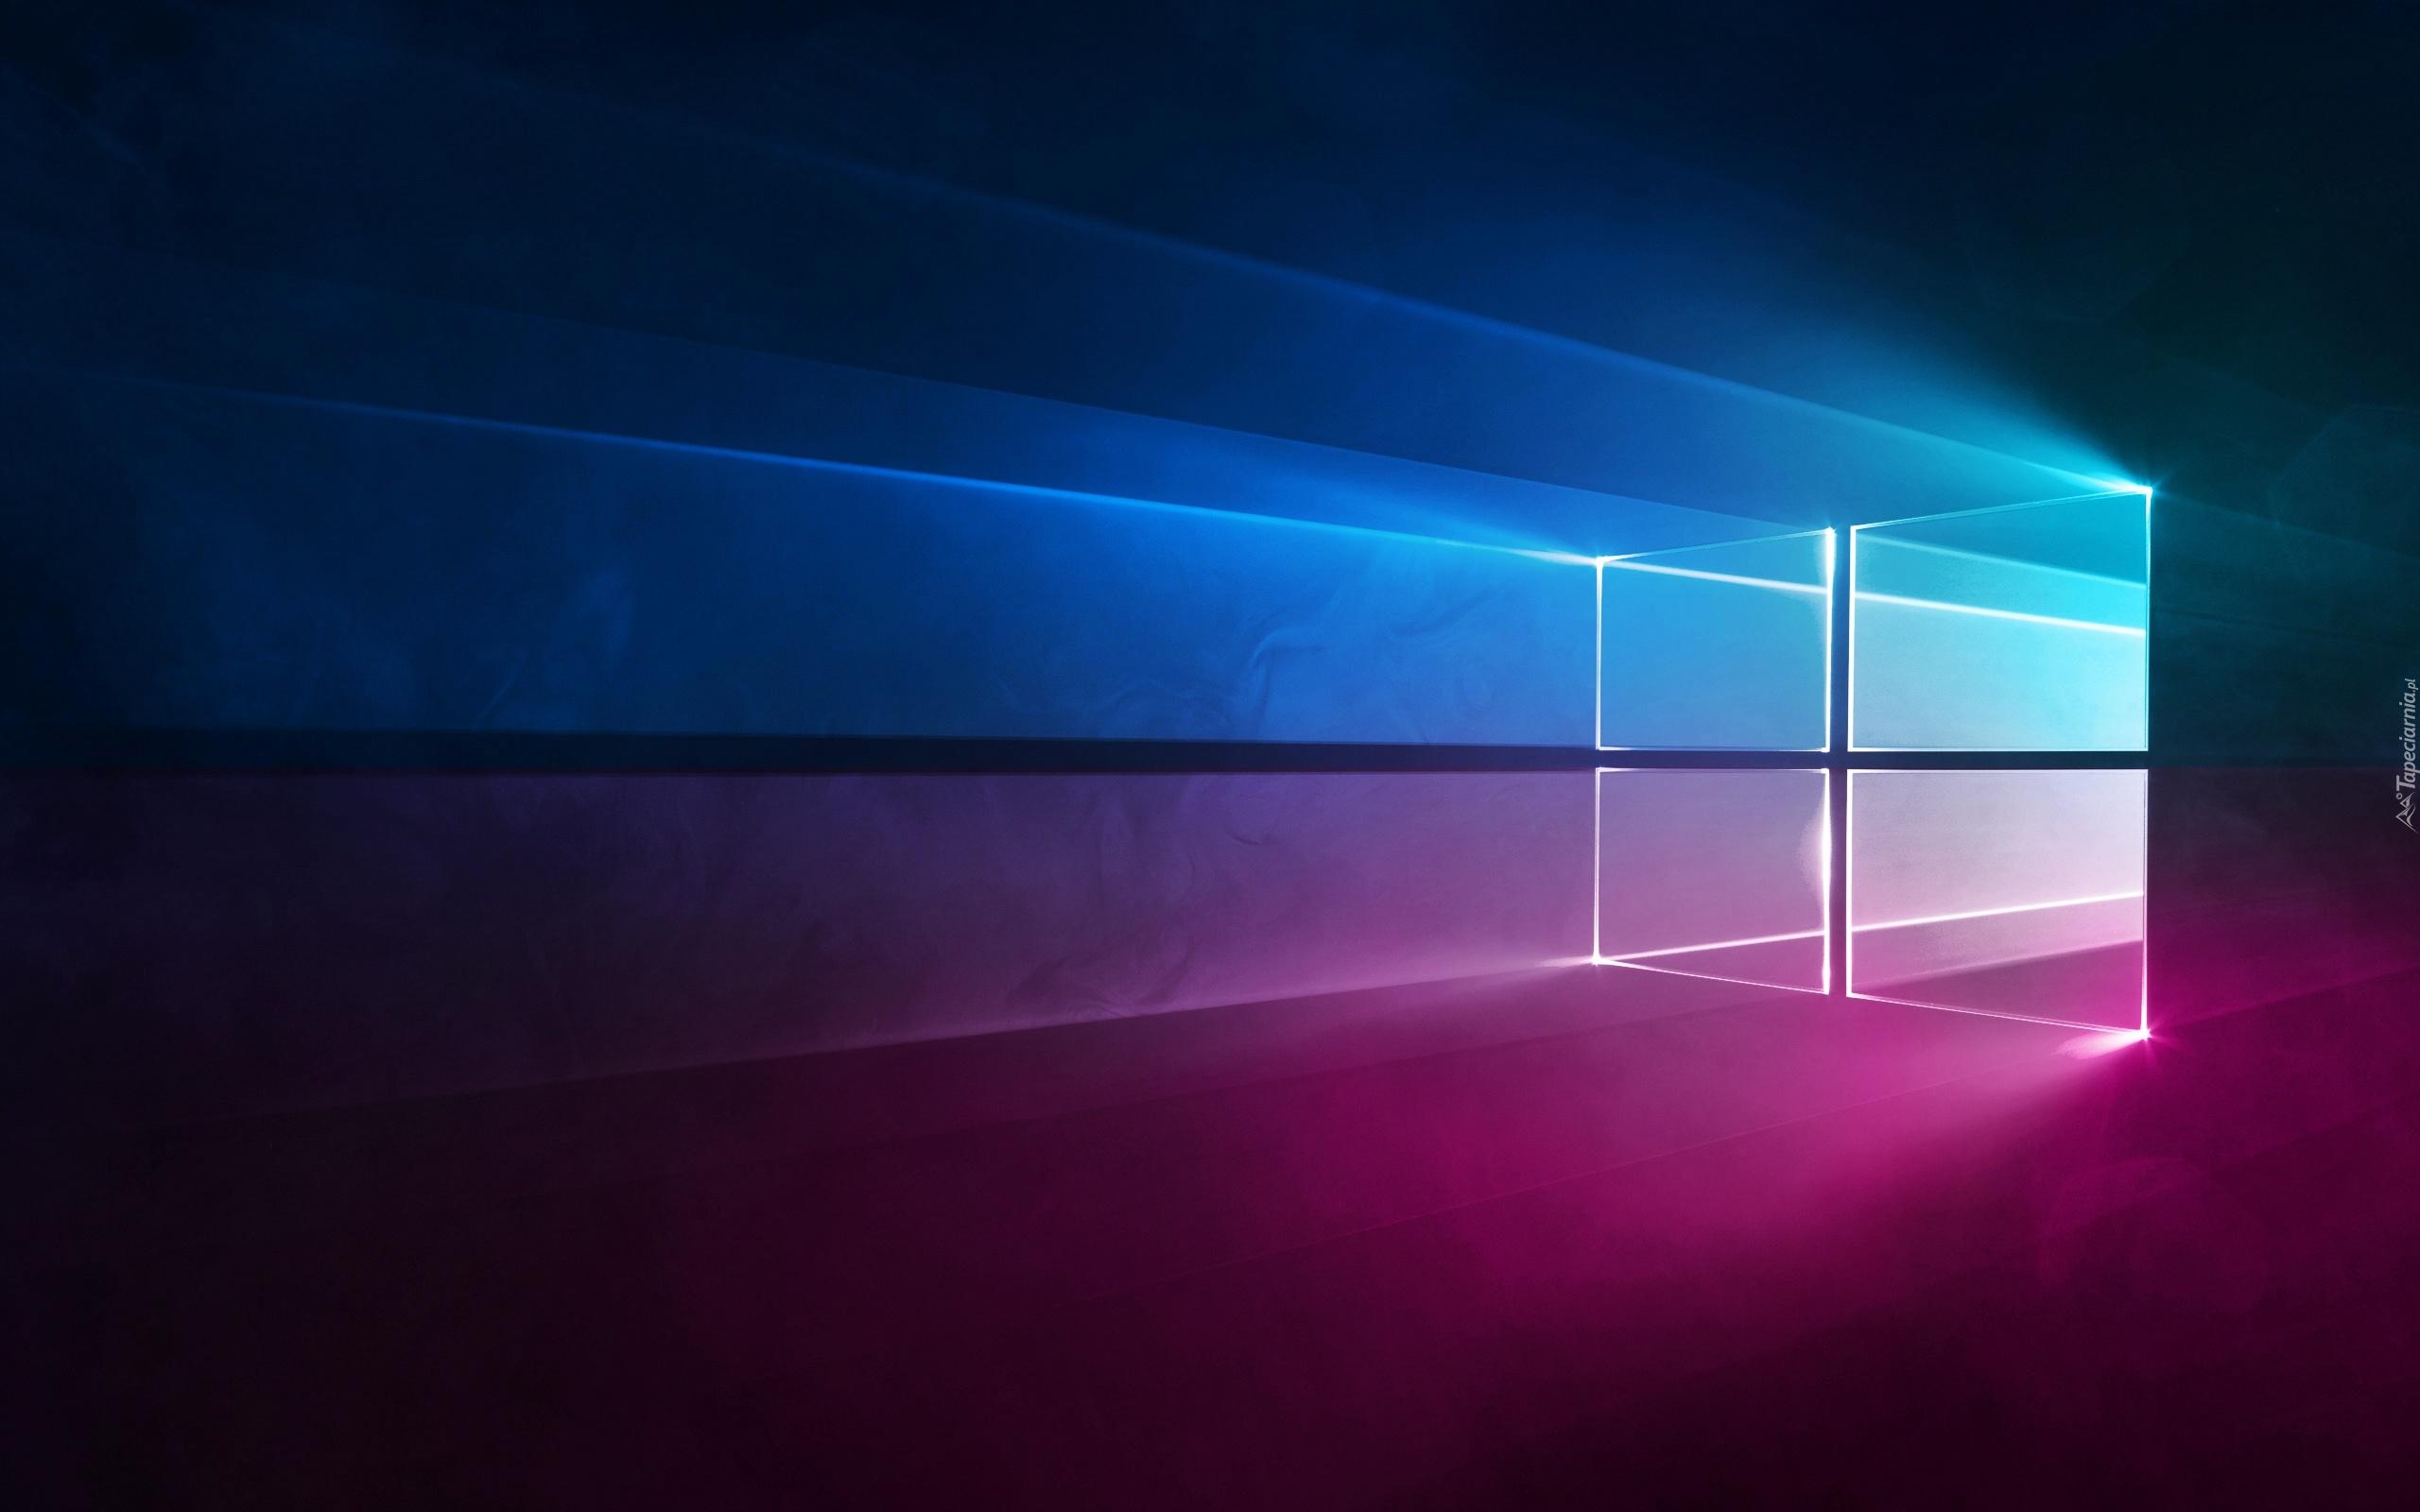 Windows 10 for Photo ecran w10